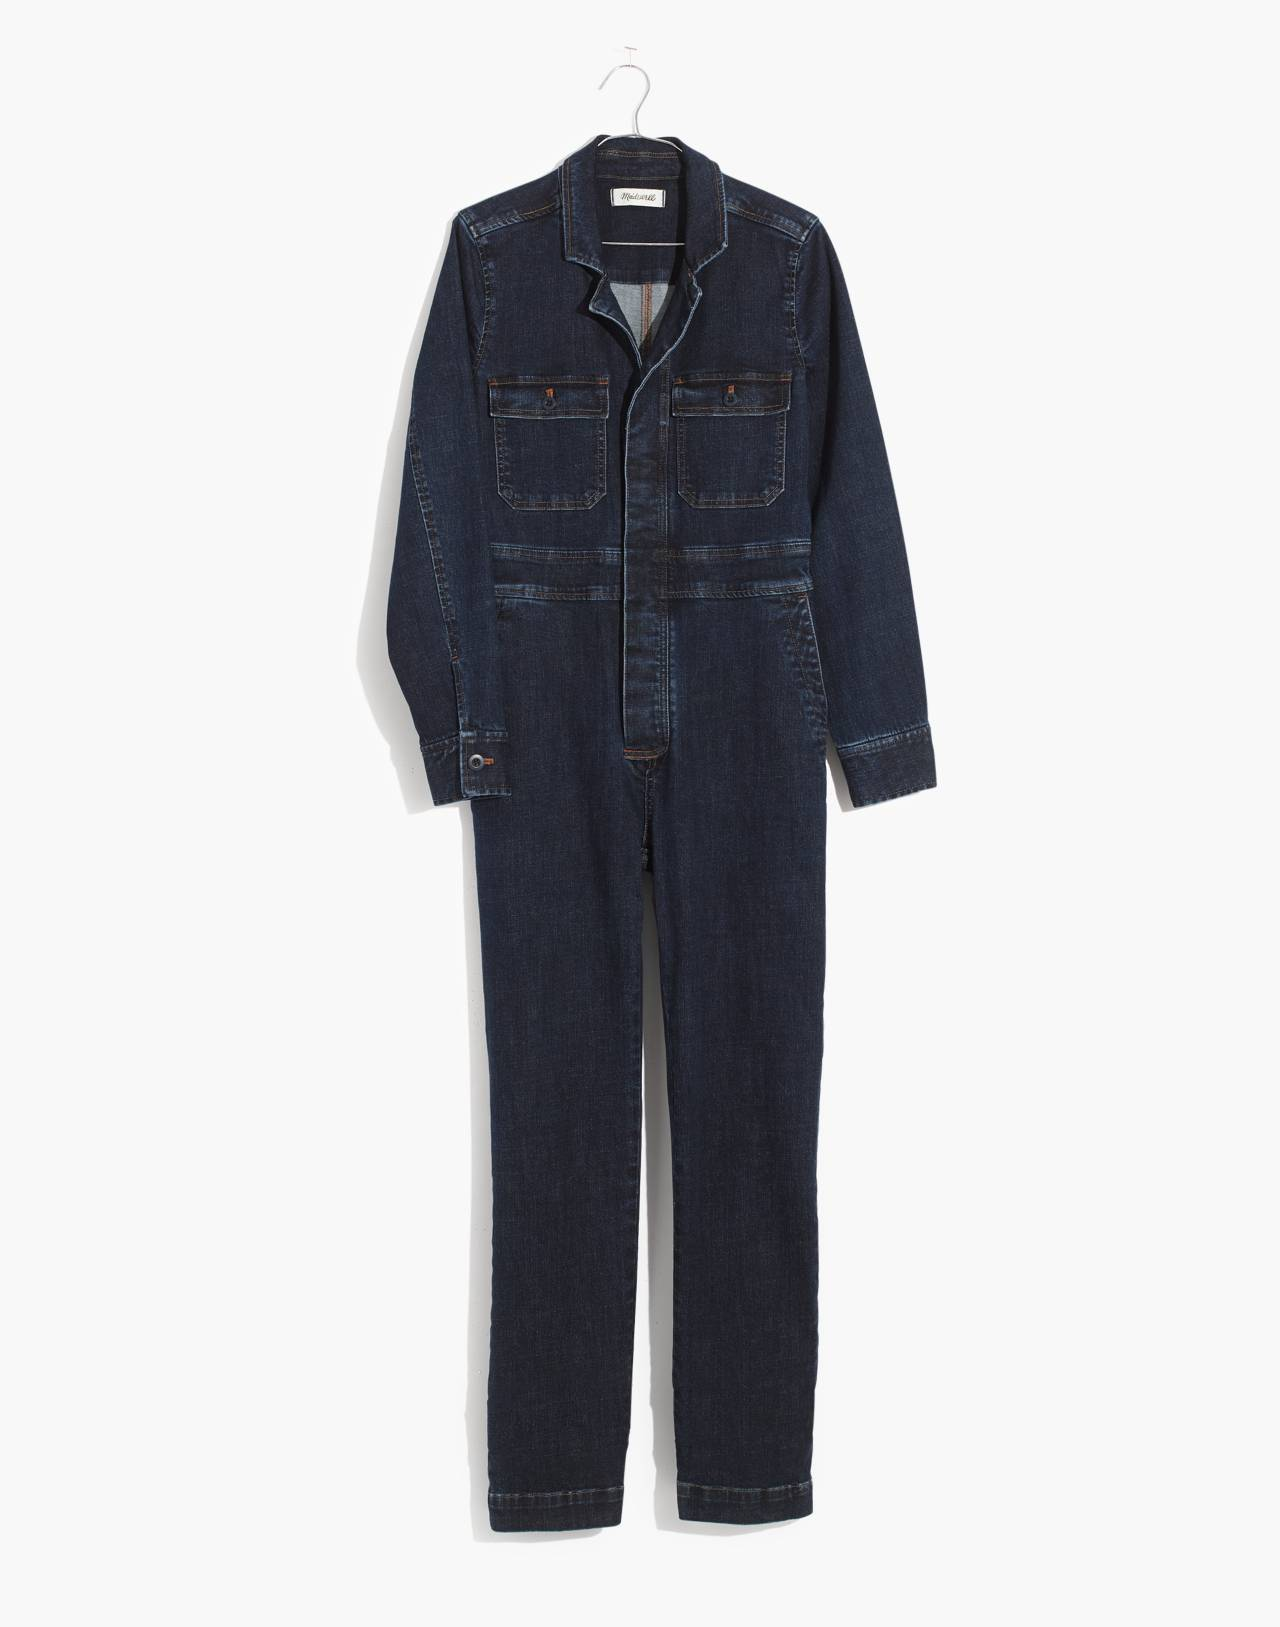 Denim Slim Coverall Jumpsuit in fanning wash image 4